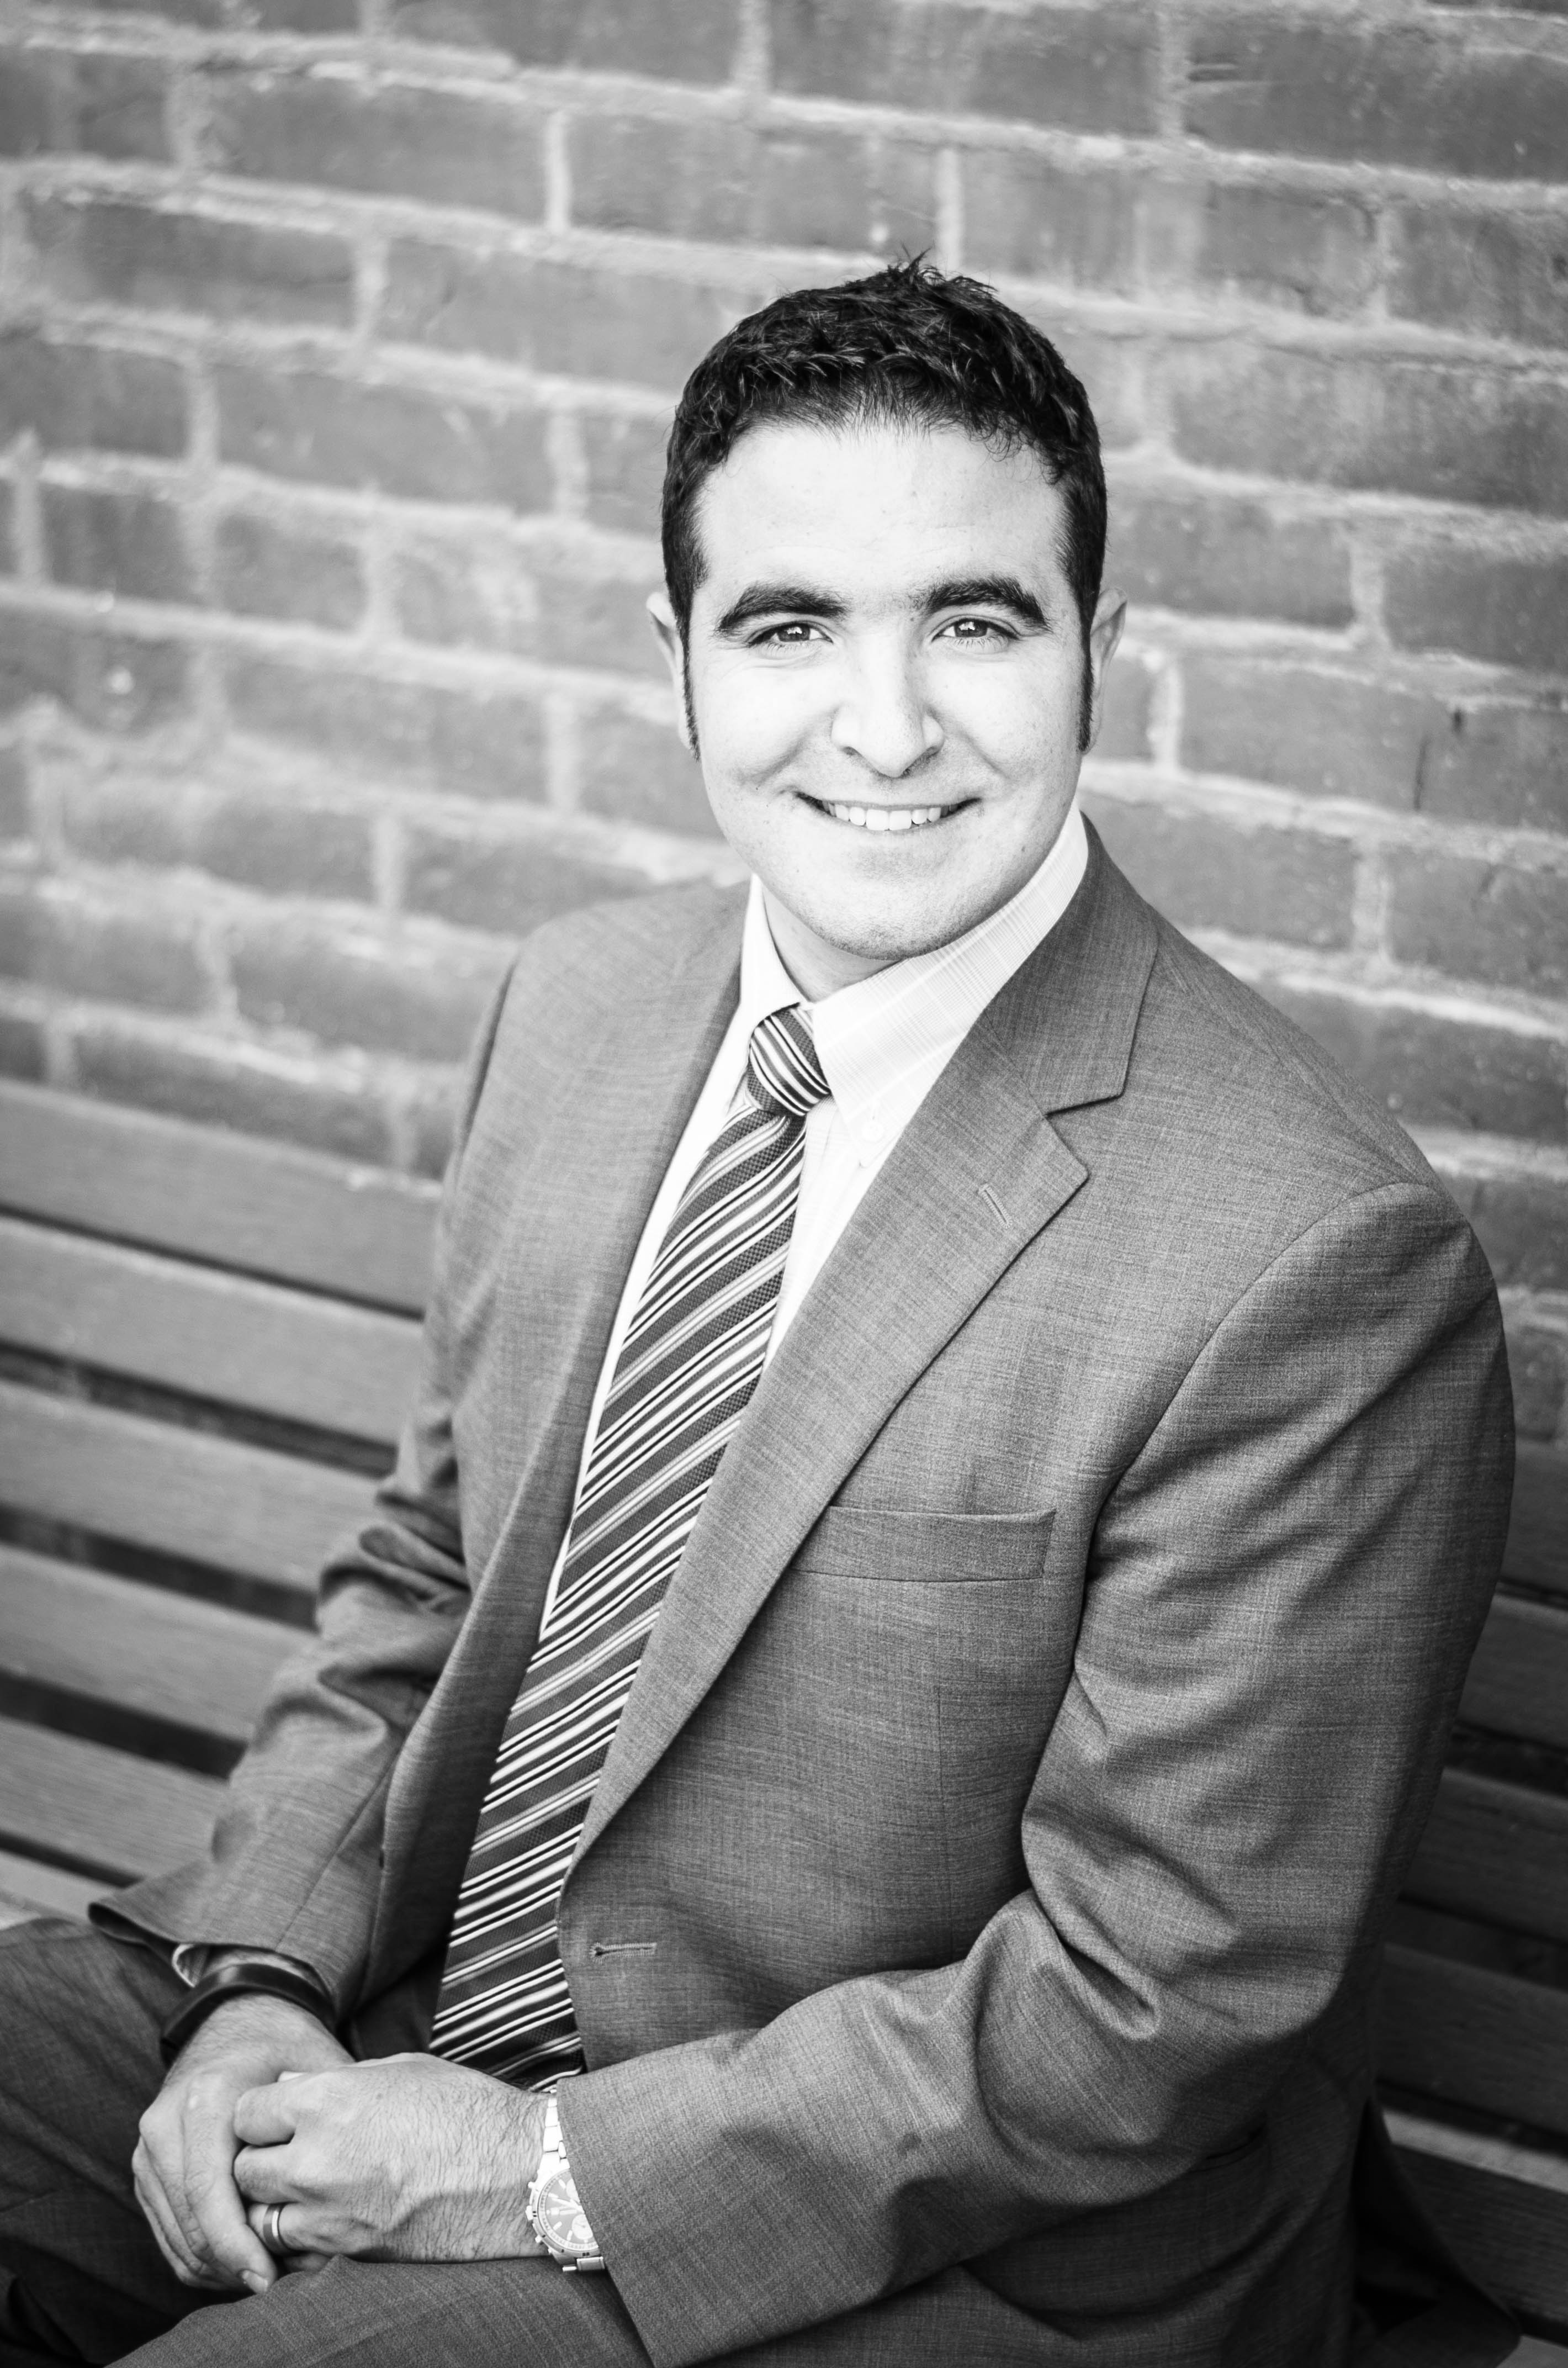 Photo of Joe Eiguren Manager of Intelligent Office in Boise